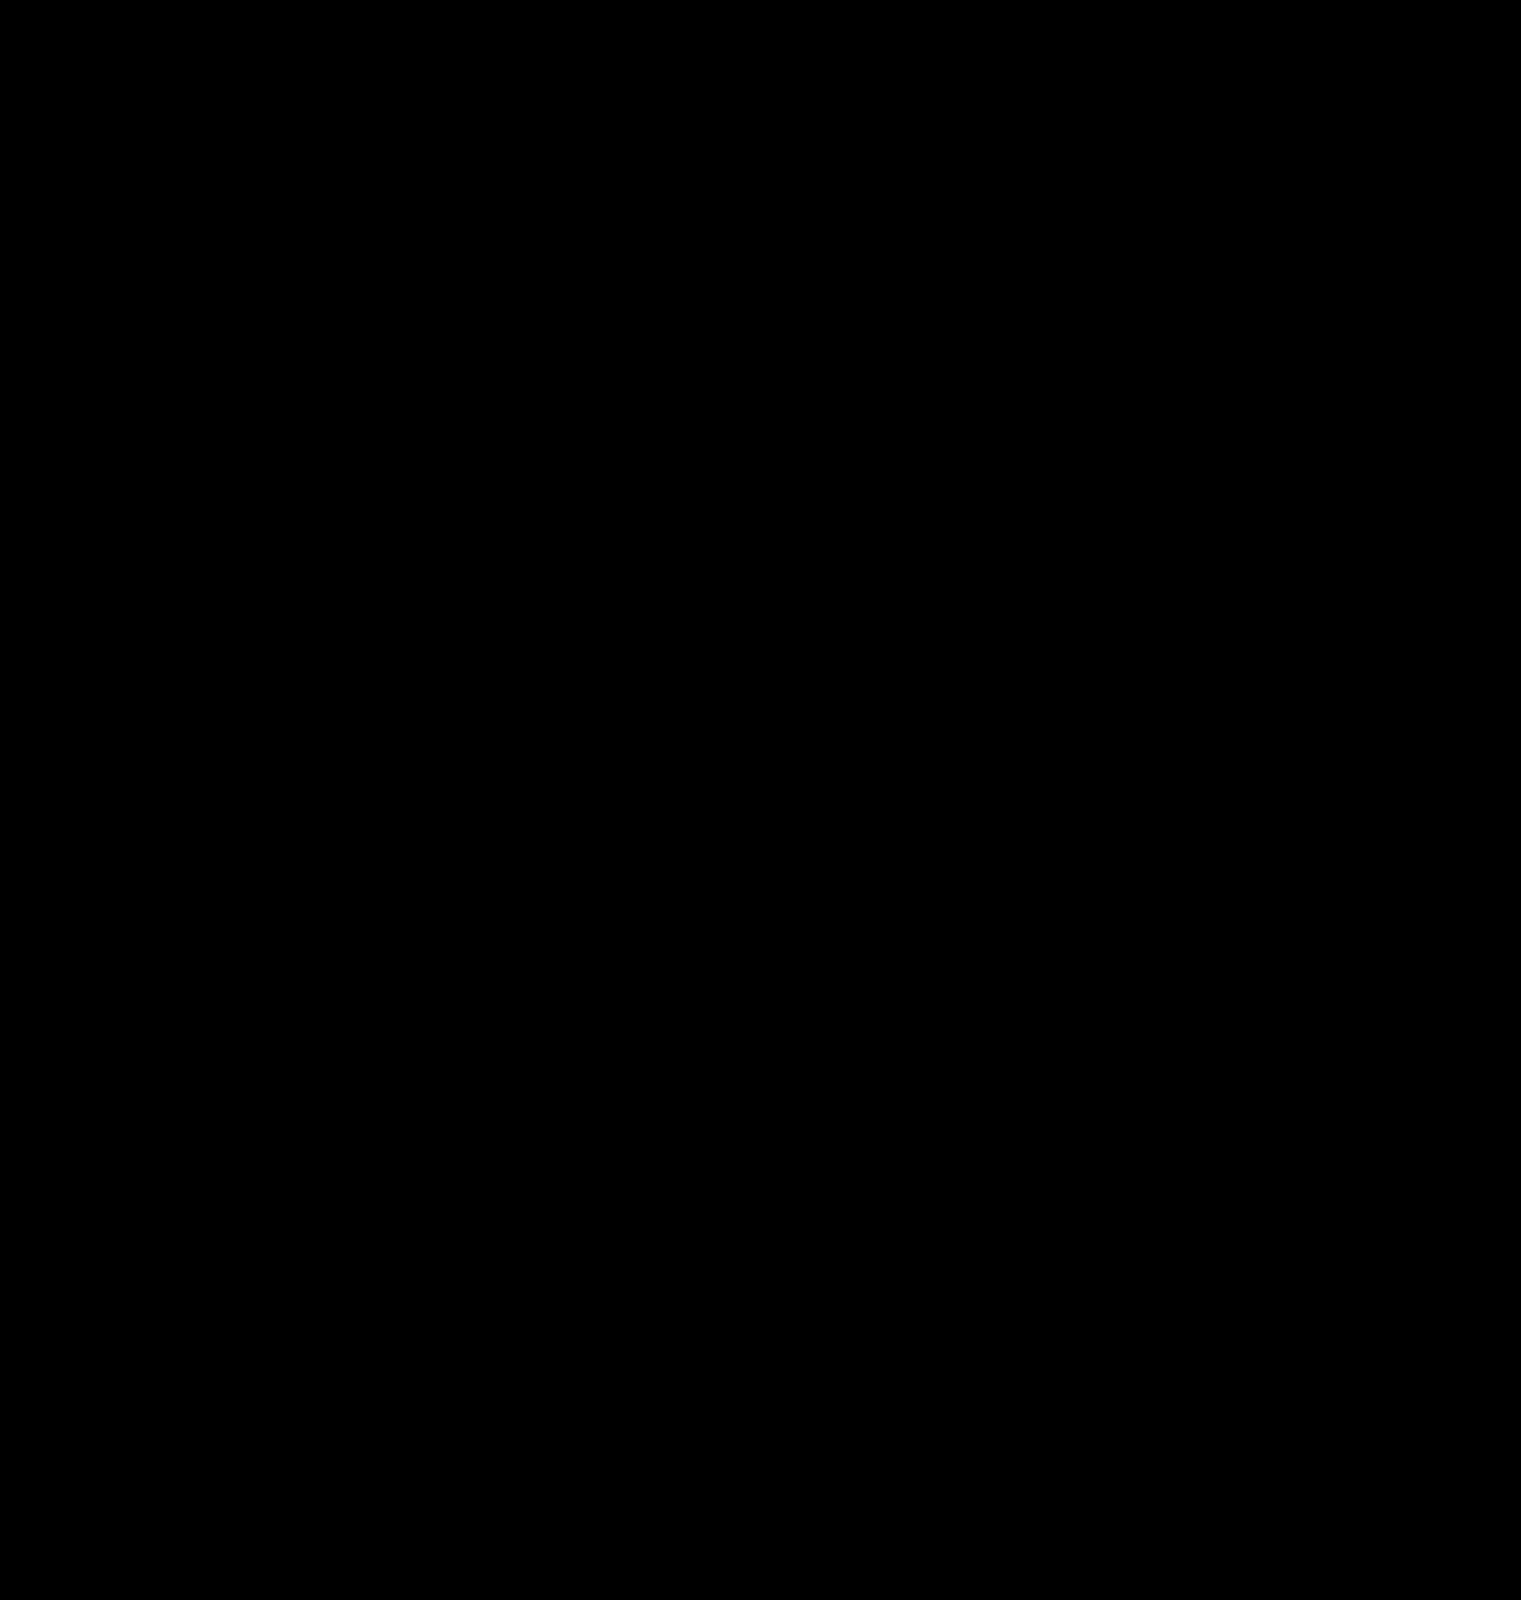 1_pentagono